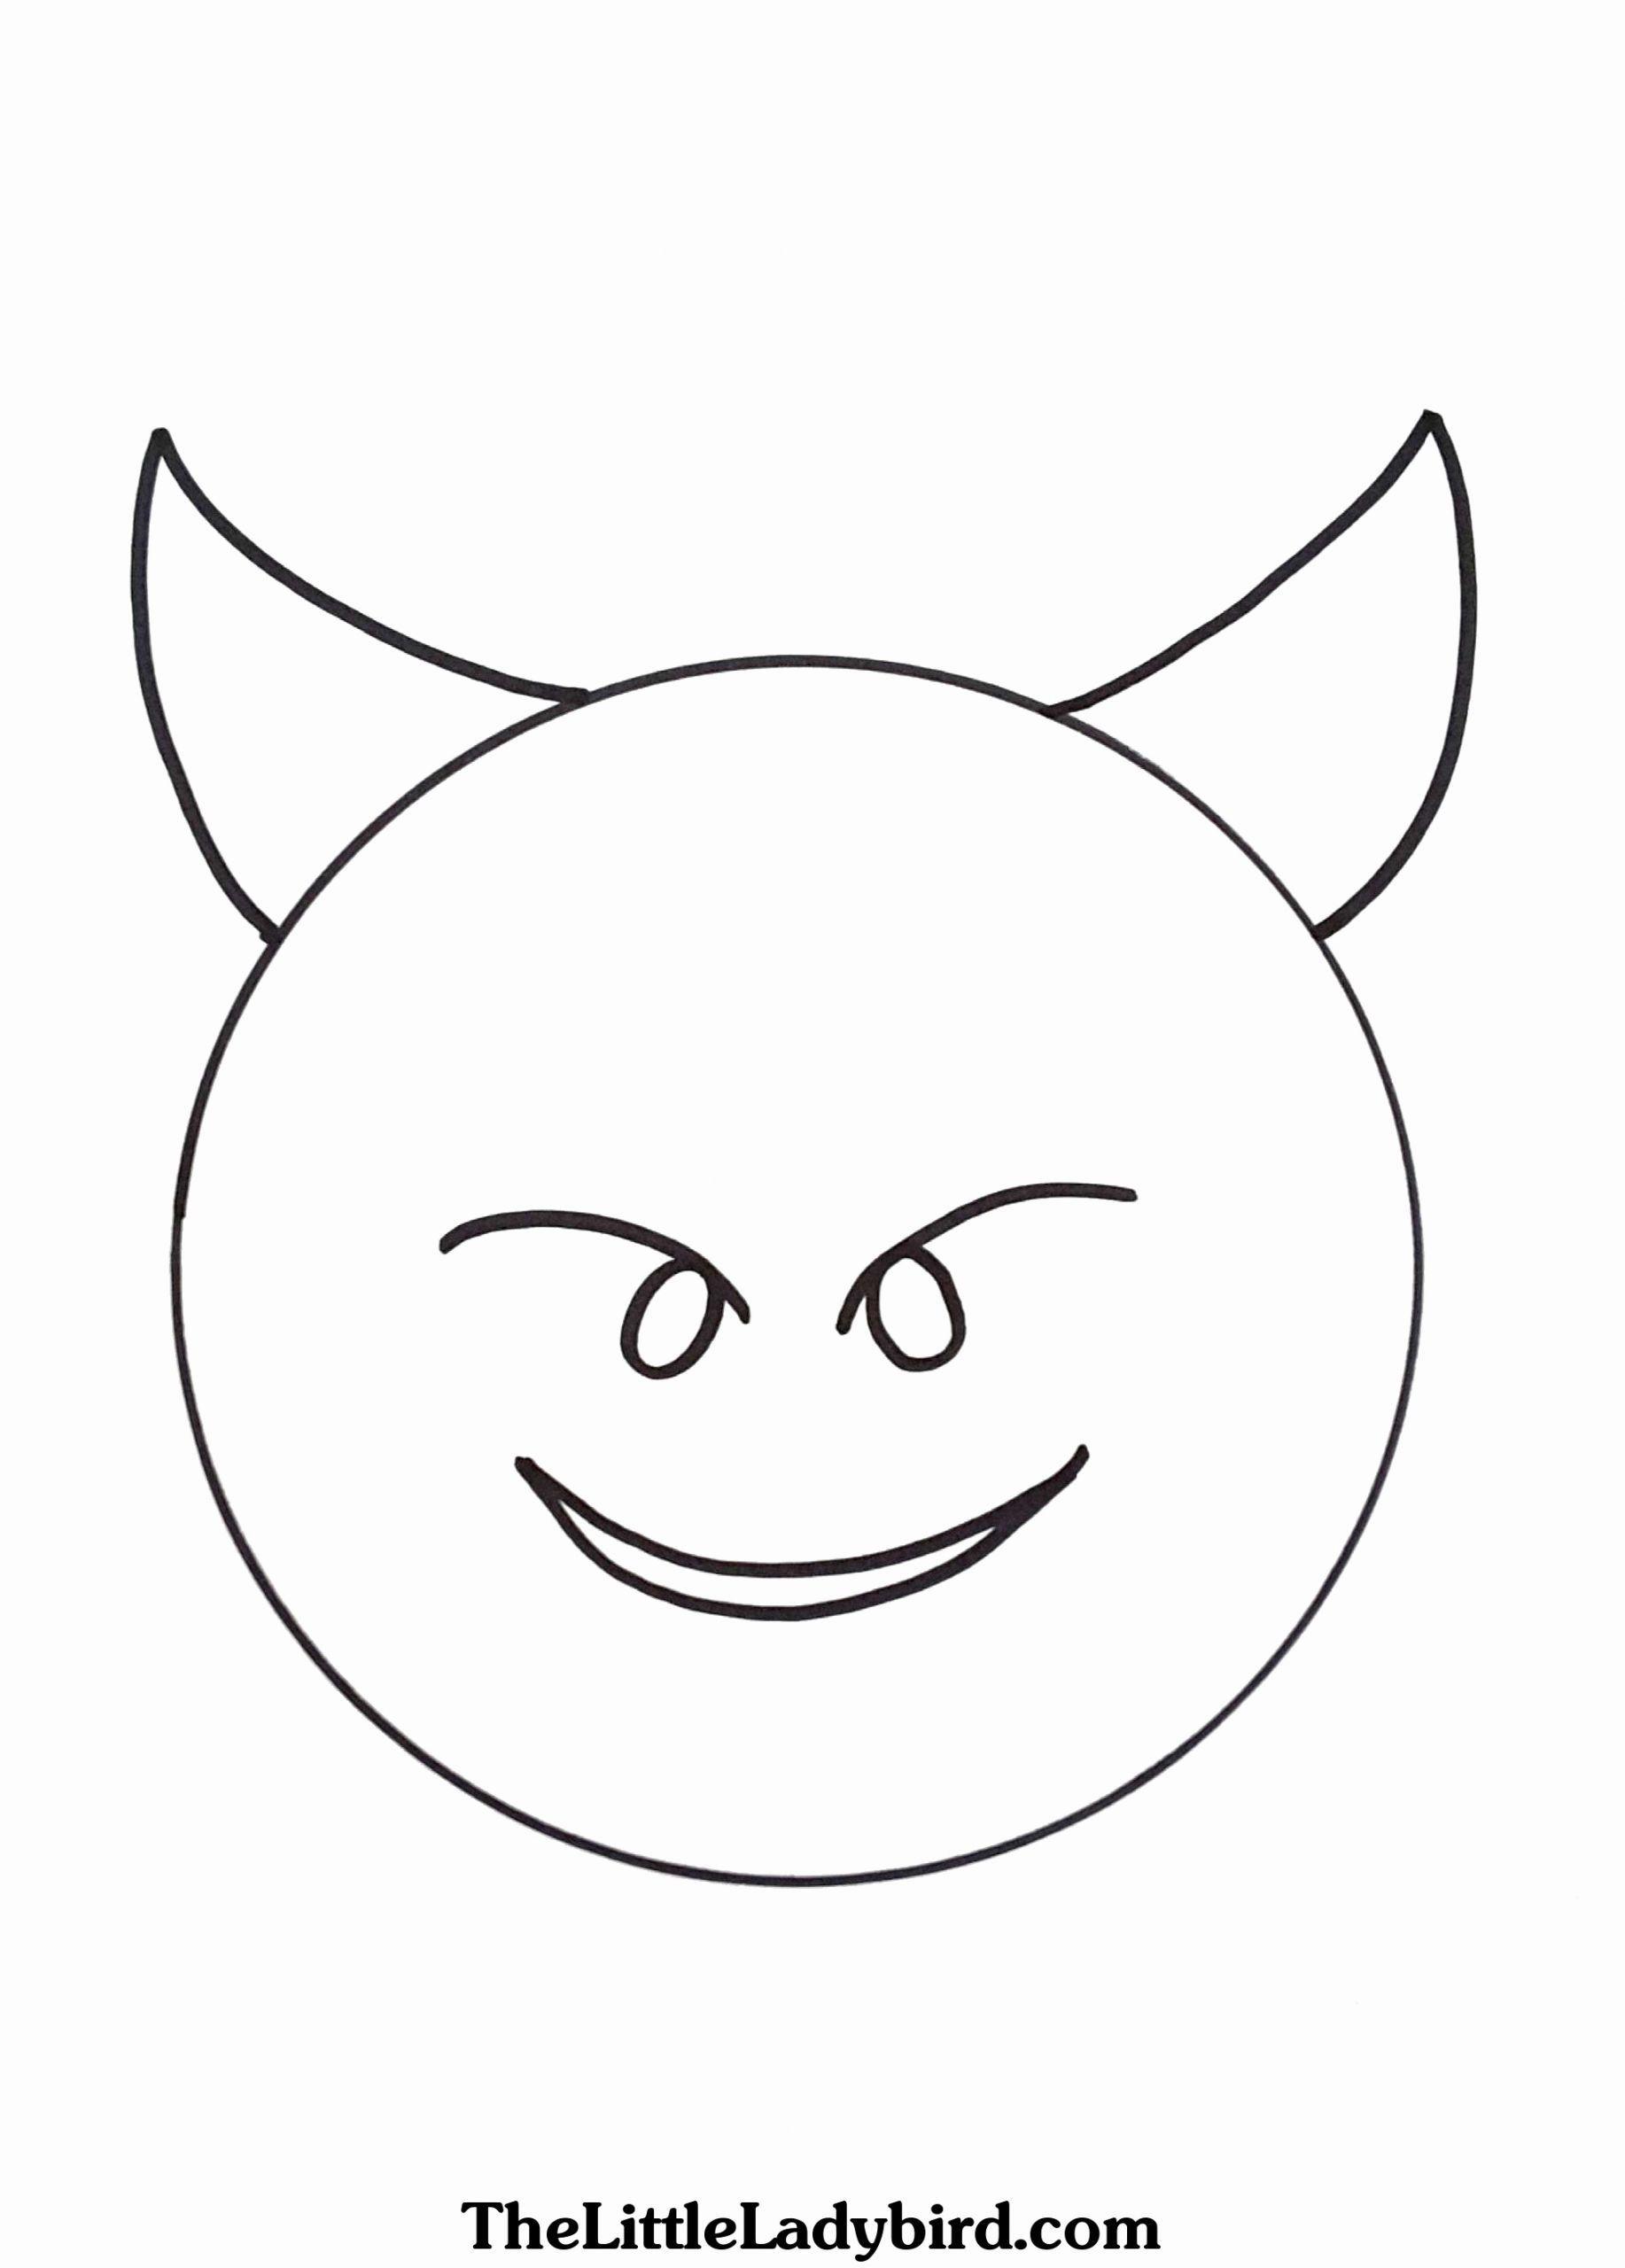 24 Unicorn Emoji Coloring Page Niceladiesnaughtybooks Com Emoji Coloring Pages Coloring Pages For Kids Disney Princess Coloring Pages